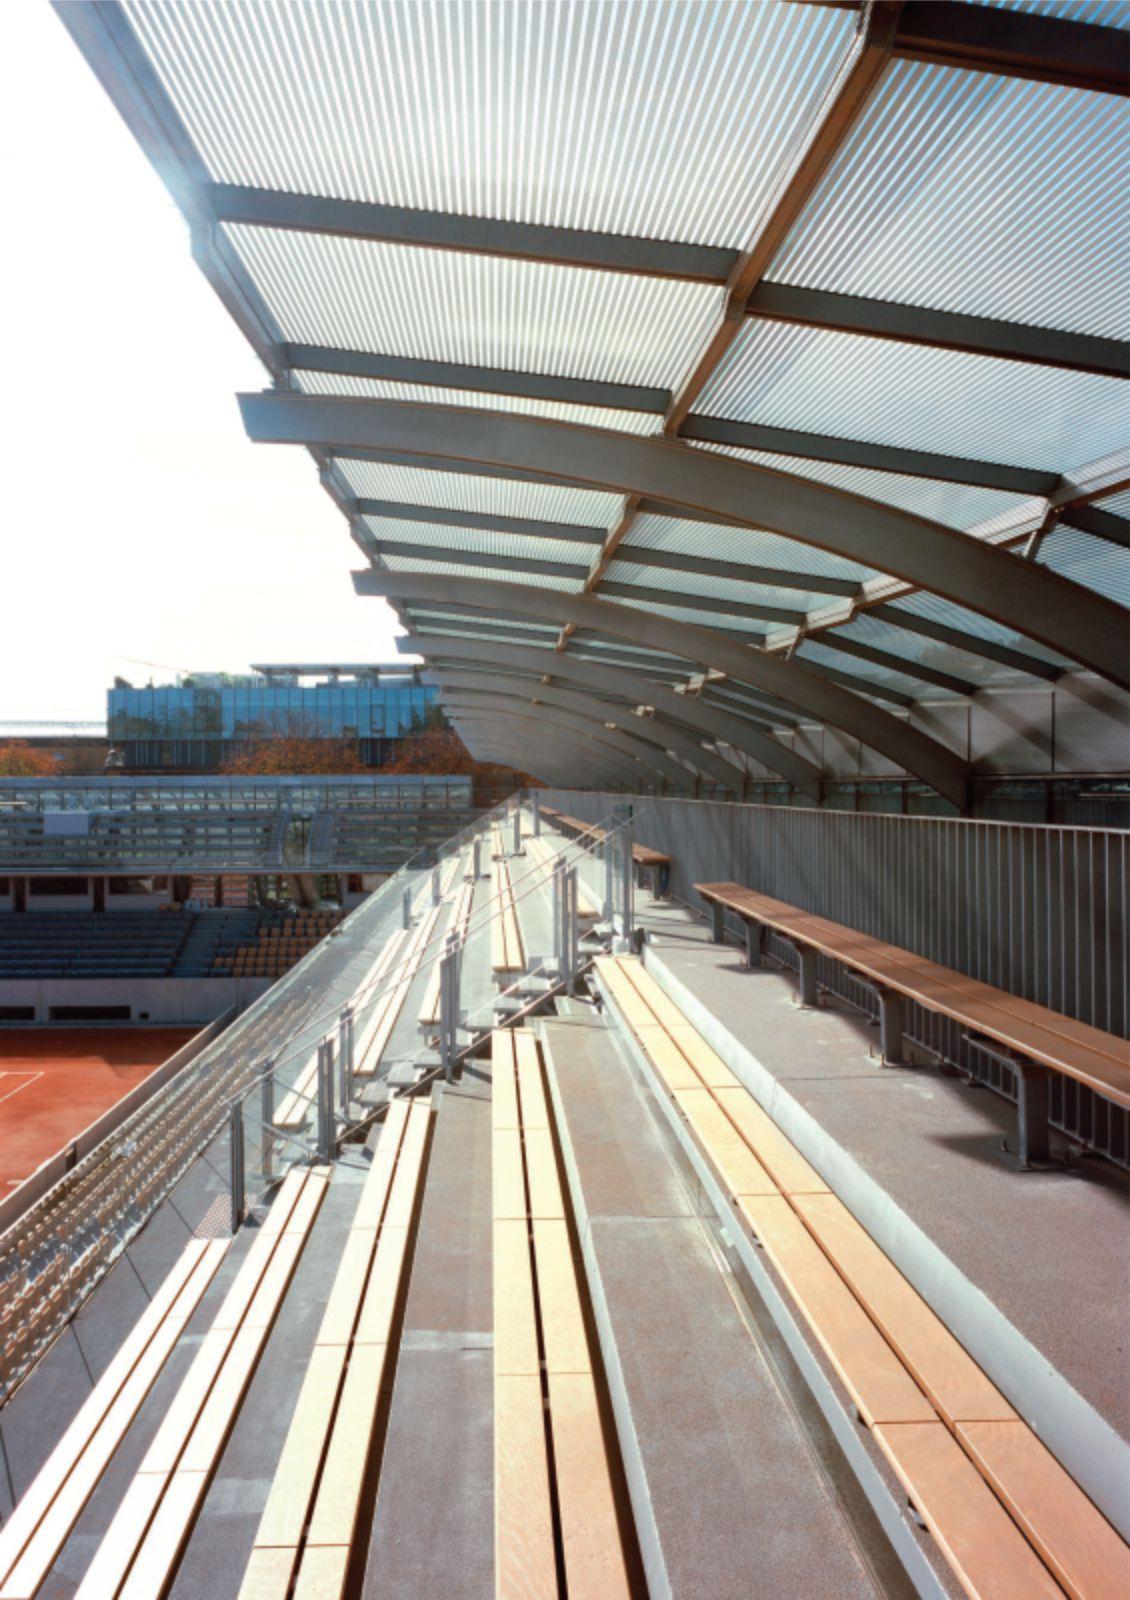 Simonne-Mathieu tennis court